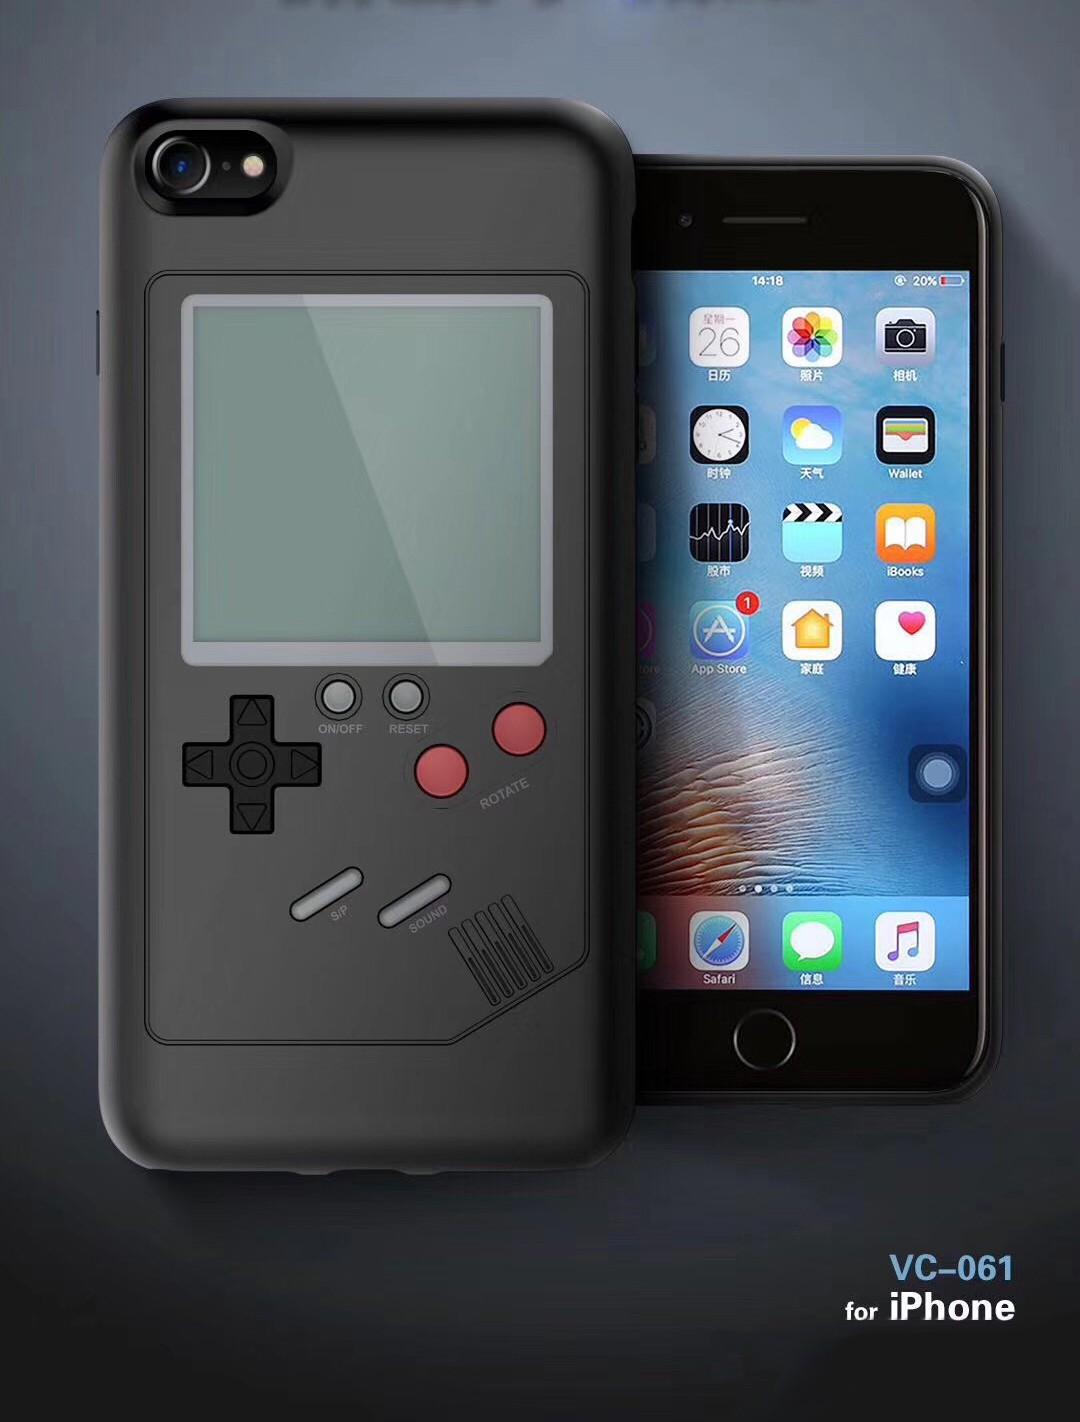 reputable site d0868 9c8d0 iPhone 7/8 PLUS Game Case Black - Games Console with Classic Games (Tetris,  etc)